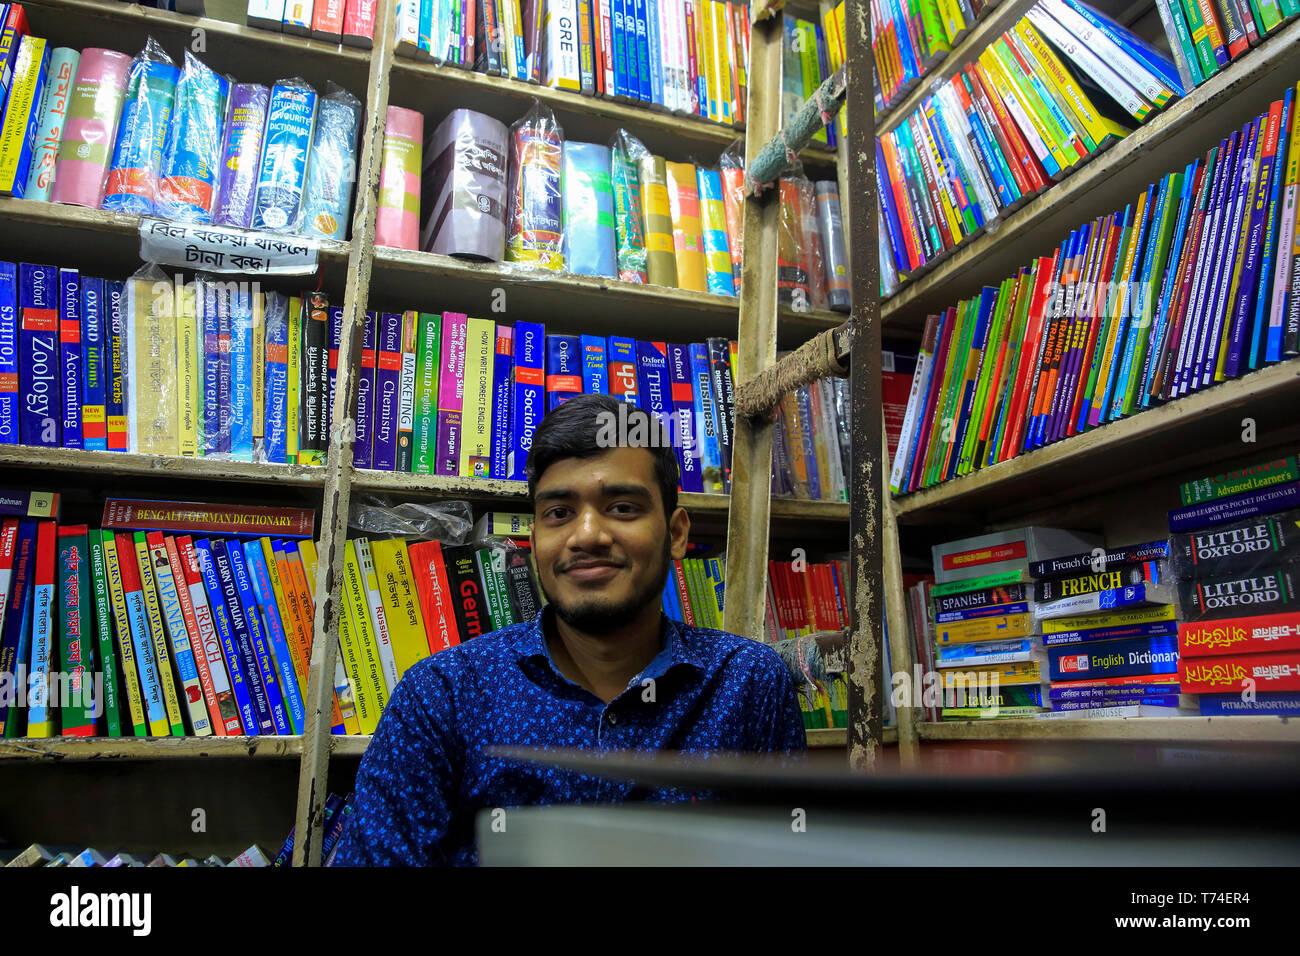 Bookshops at Nilkhet book market, Dhaka, Bangladesh. - Stock Image